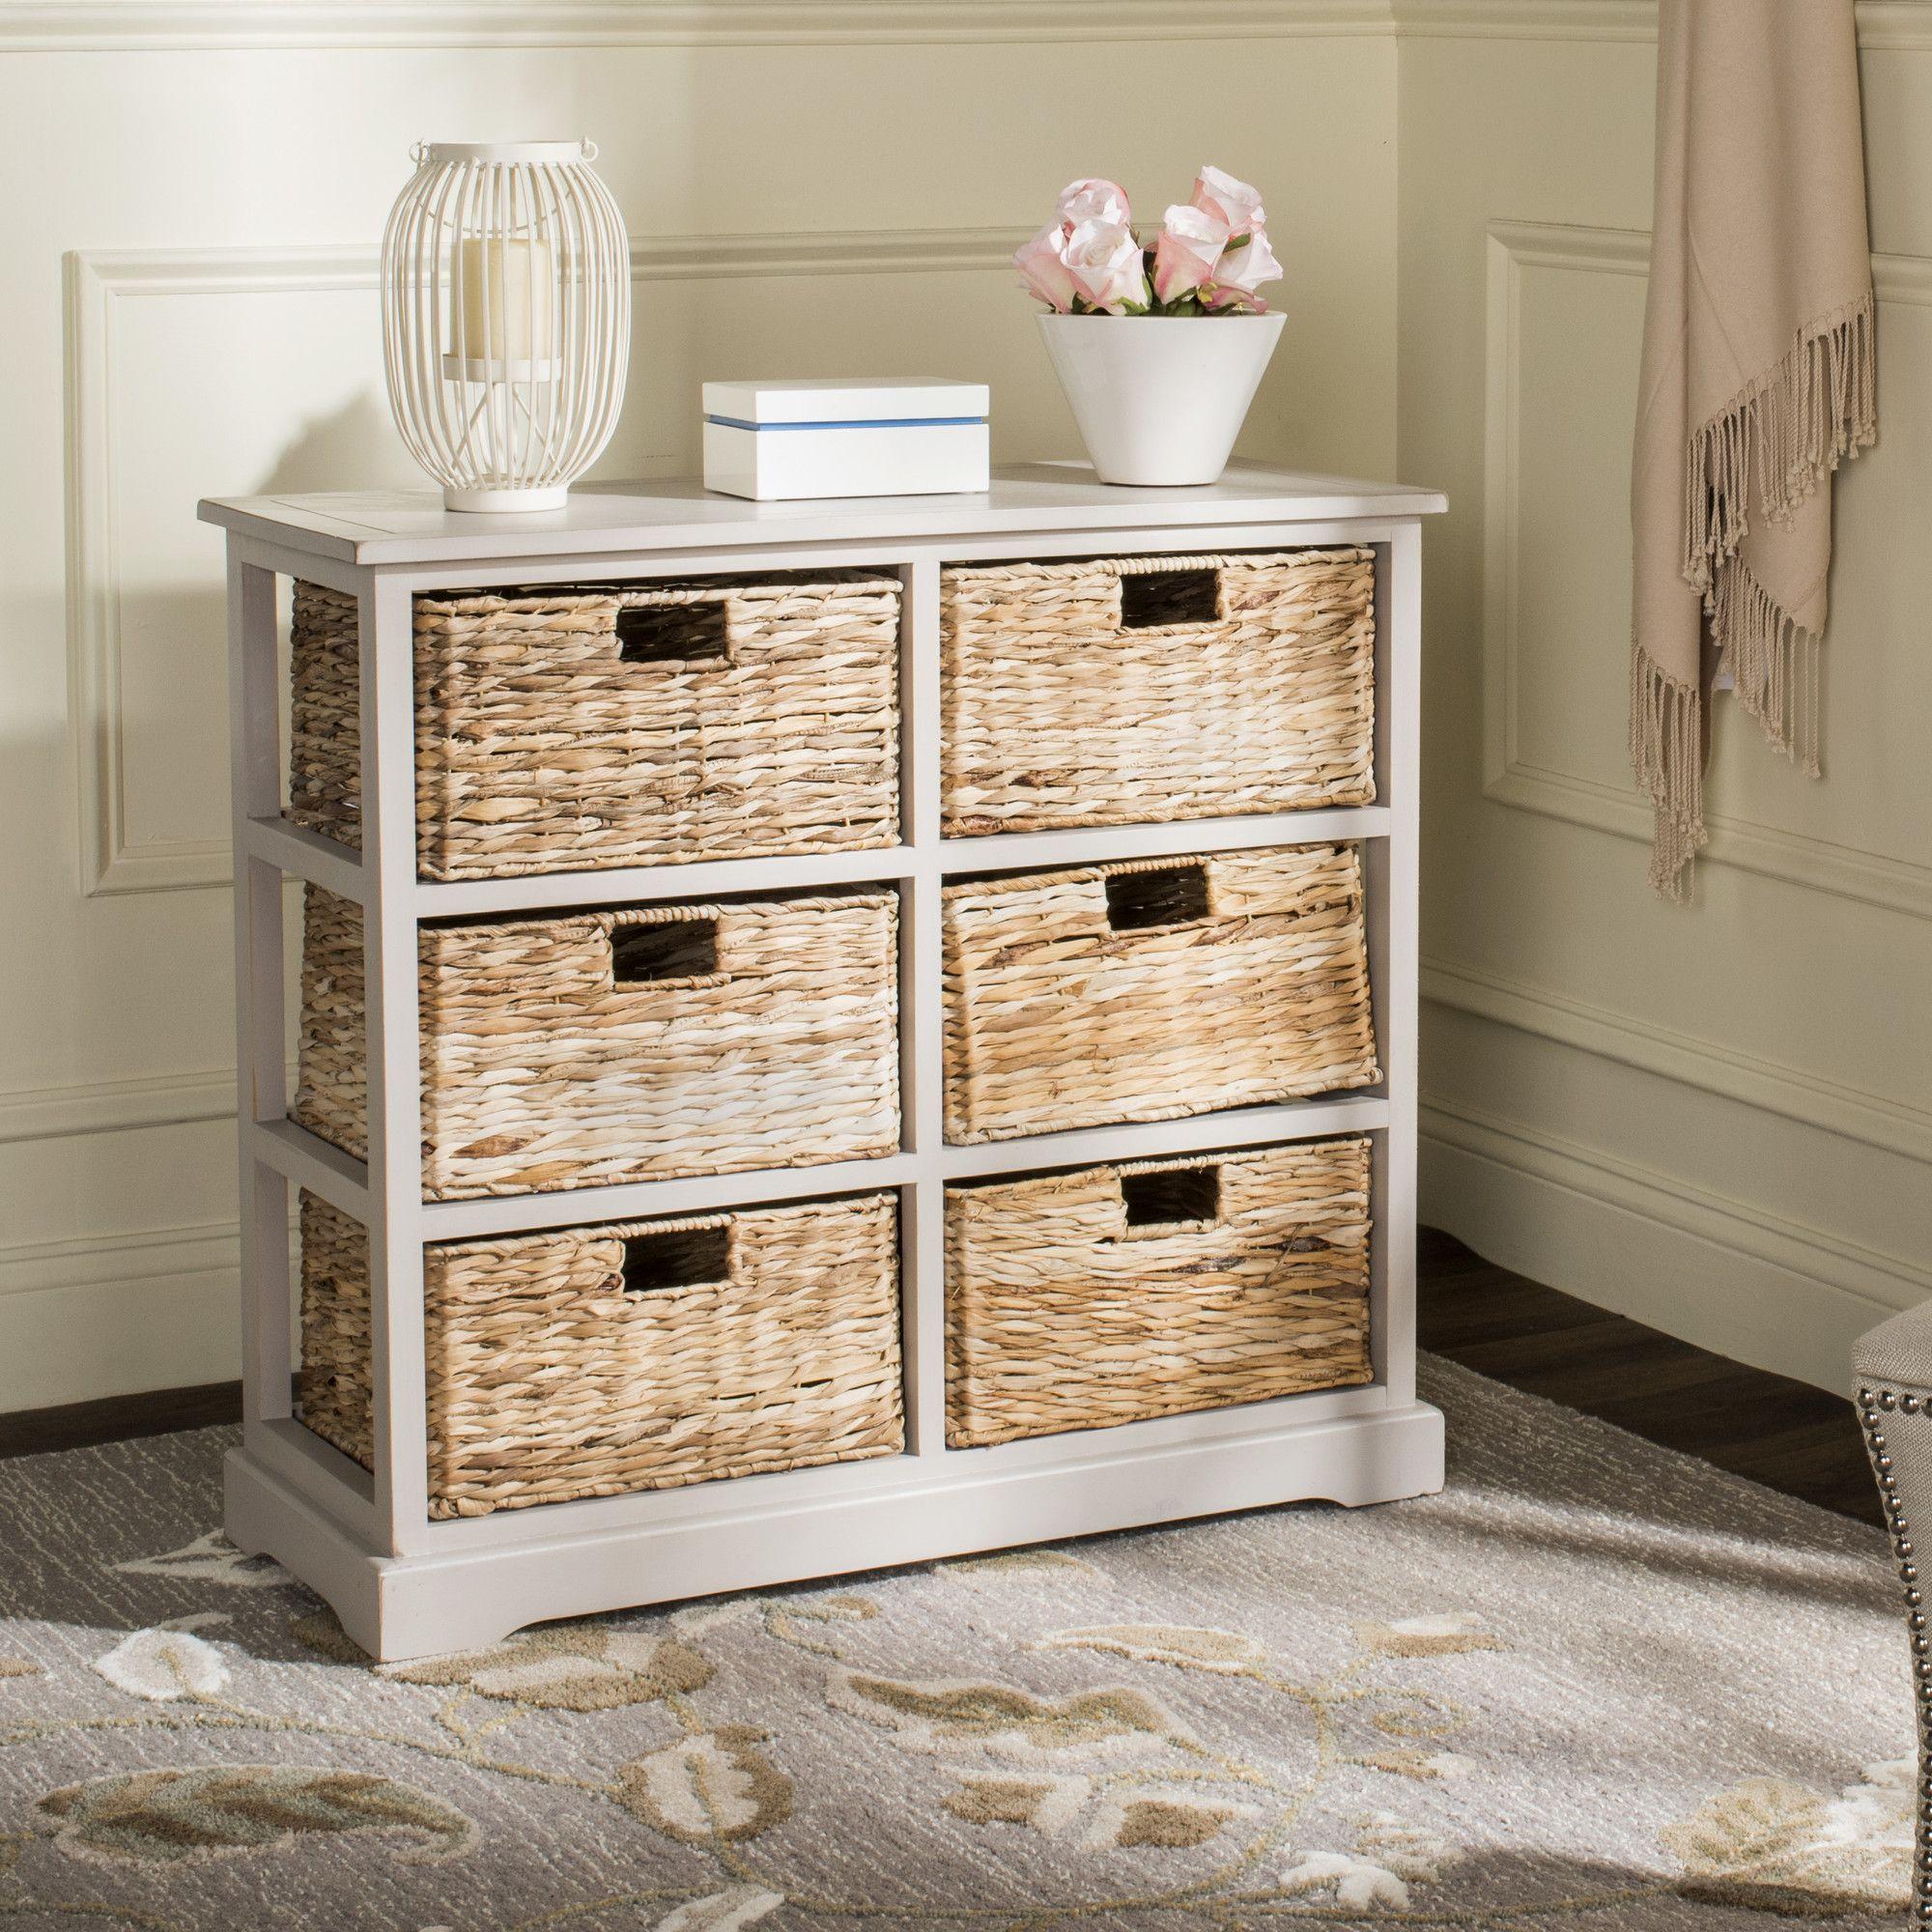 Keenan basket storage chest products pinterest basket